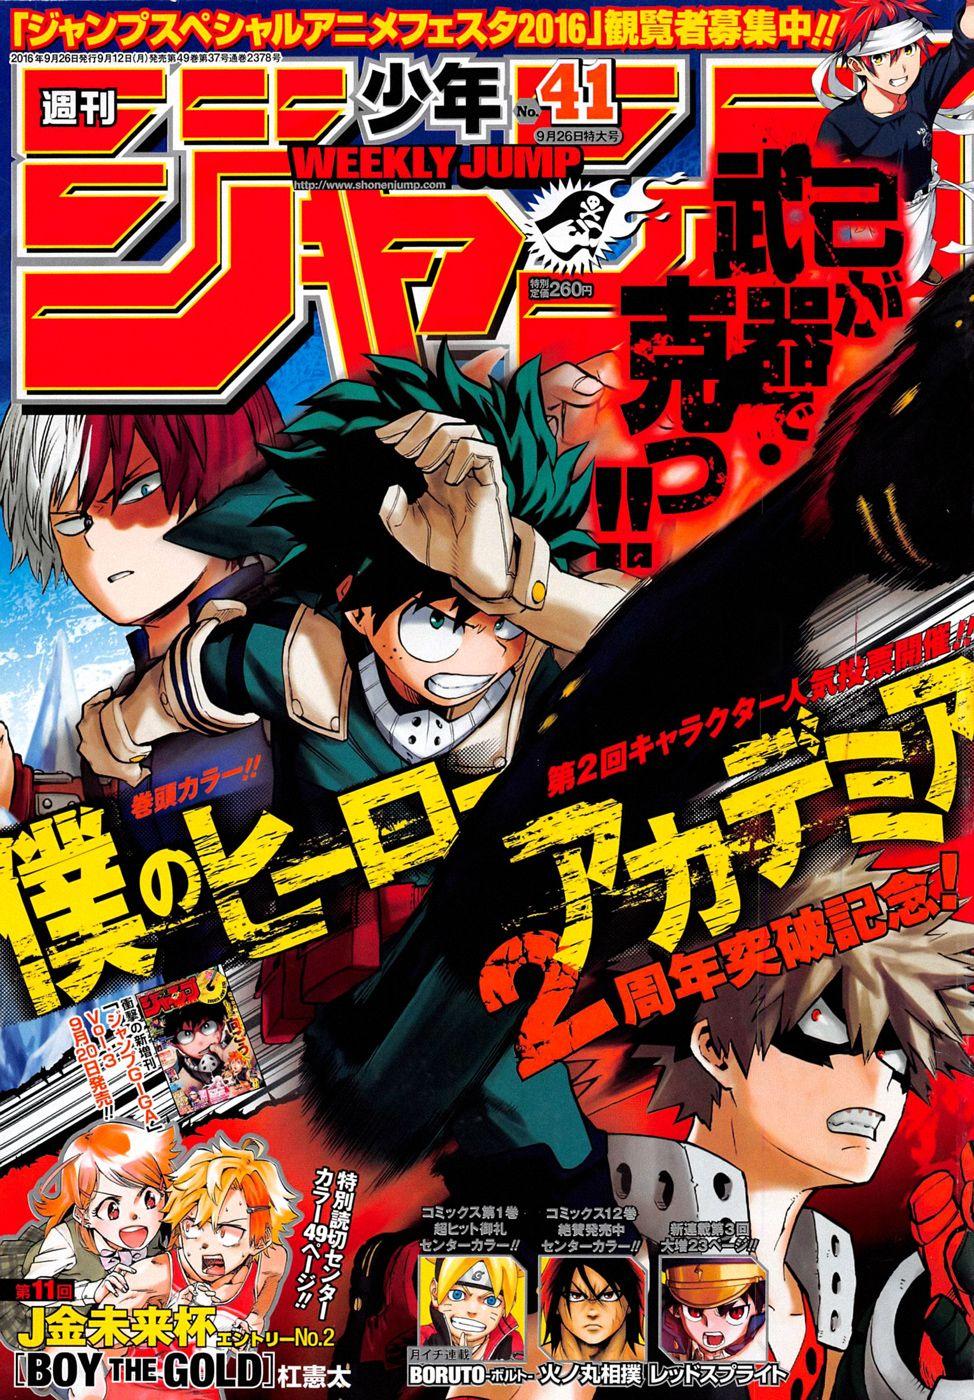 http://c5.ninemanga.com/es_manga/pic2/54/182/502077/ce0994d74ec4a72a06515065f4f2ccd8.jpg Page 3